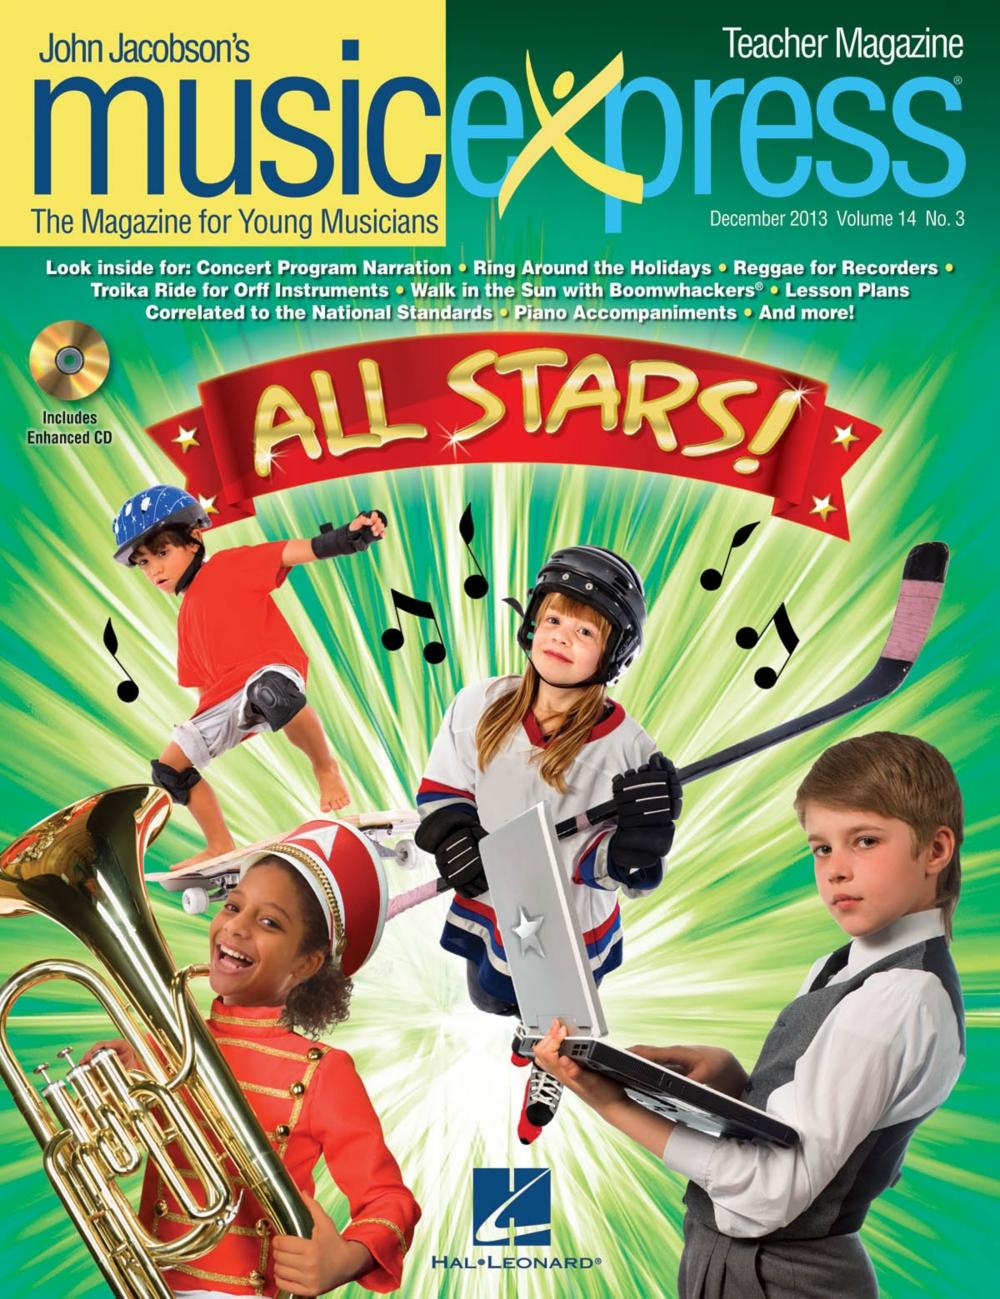 Hal Leonard All Stars Vol. 14 No. 3 (December 2013) Teacher Magazine w CD by Owl City... by Hal Leonard